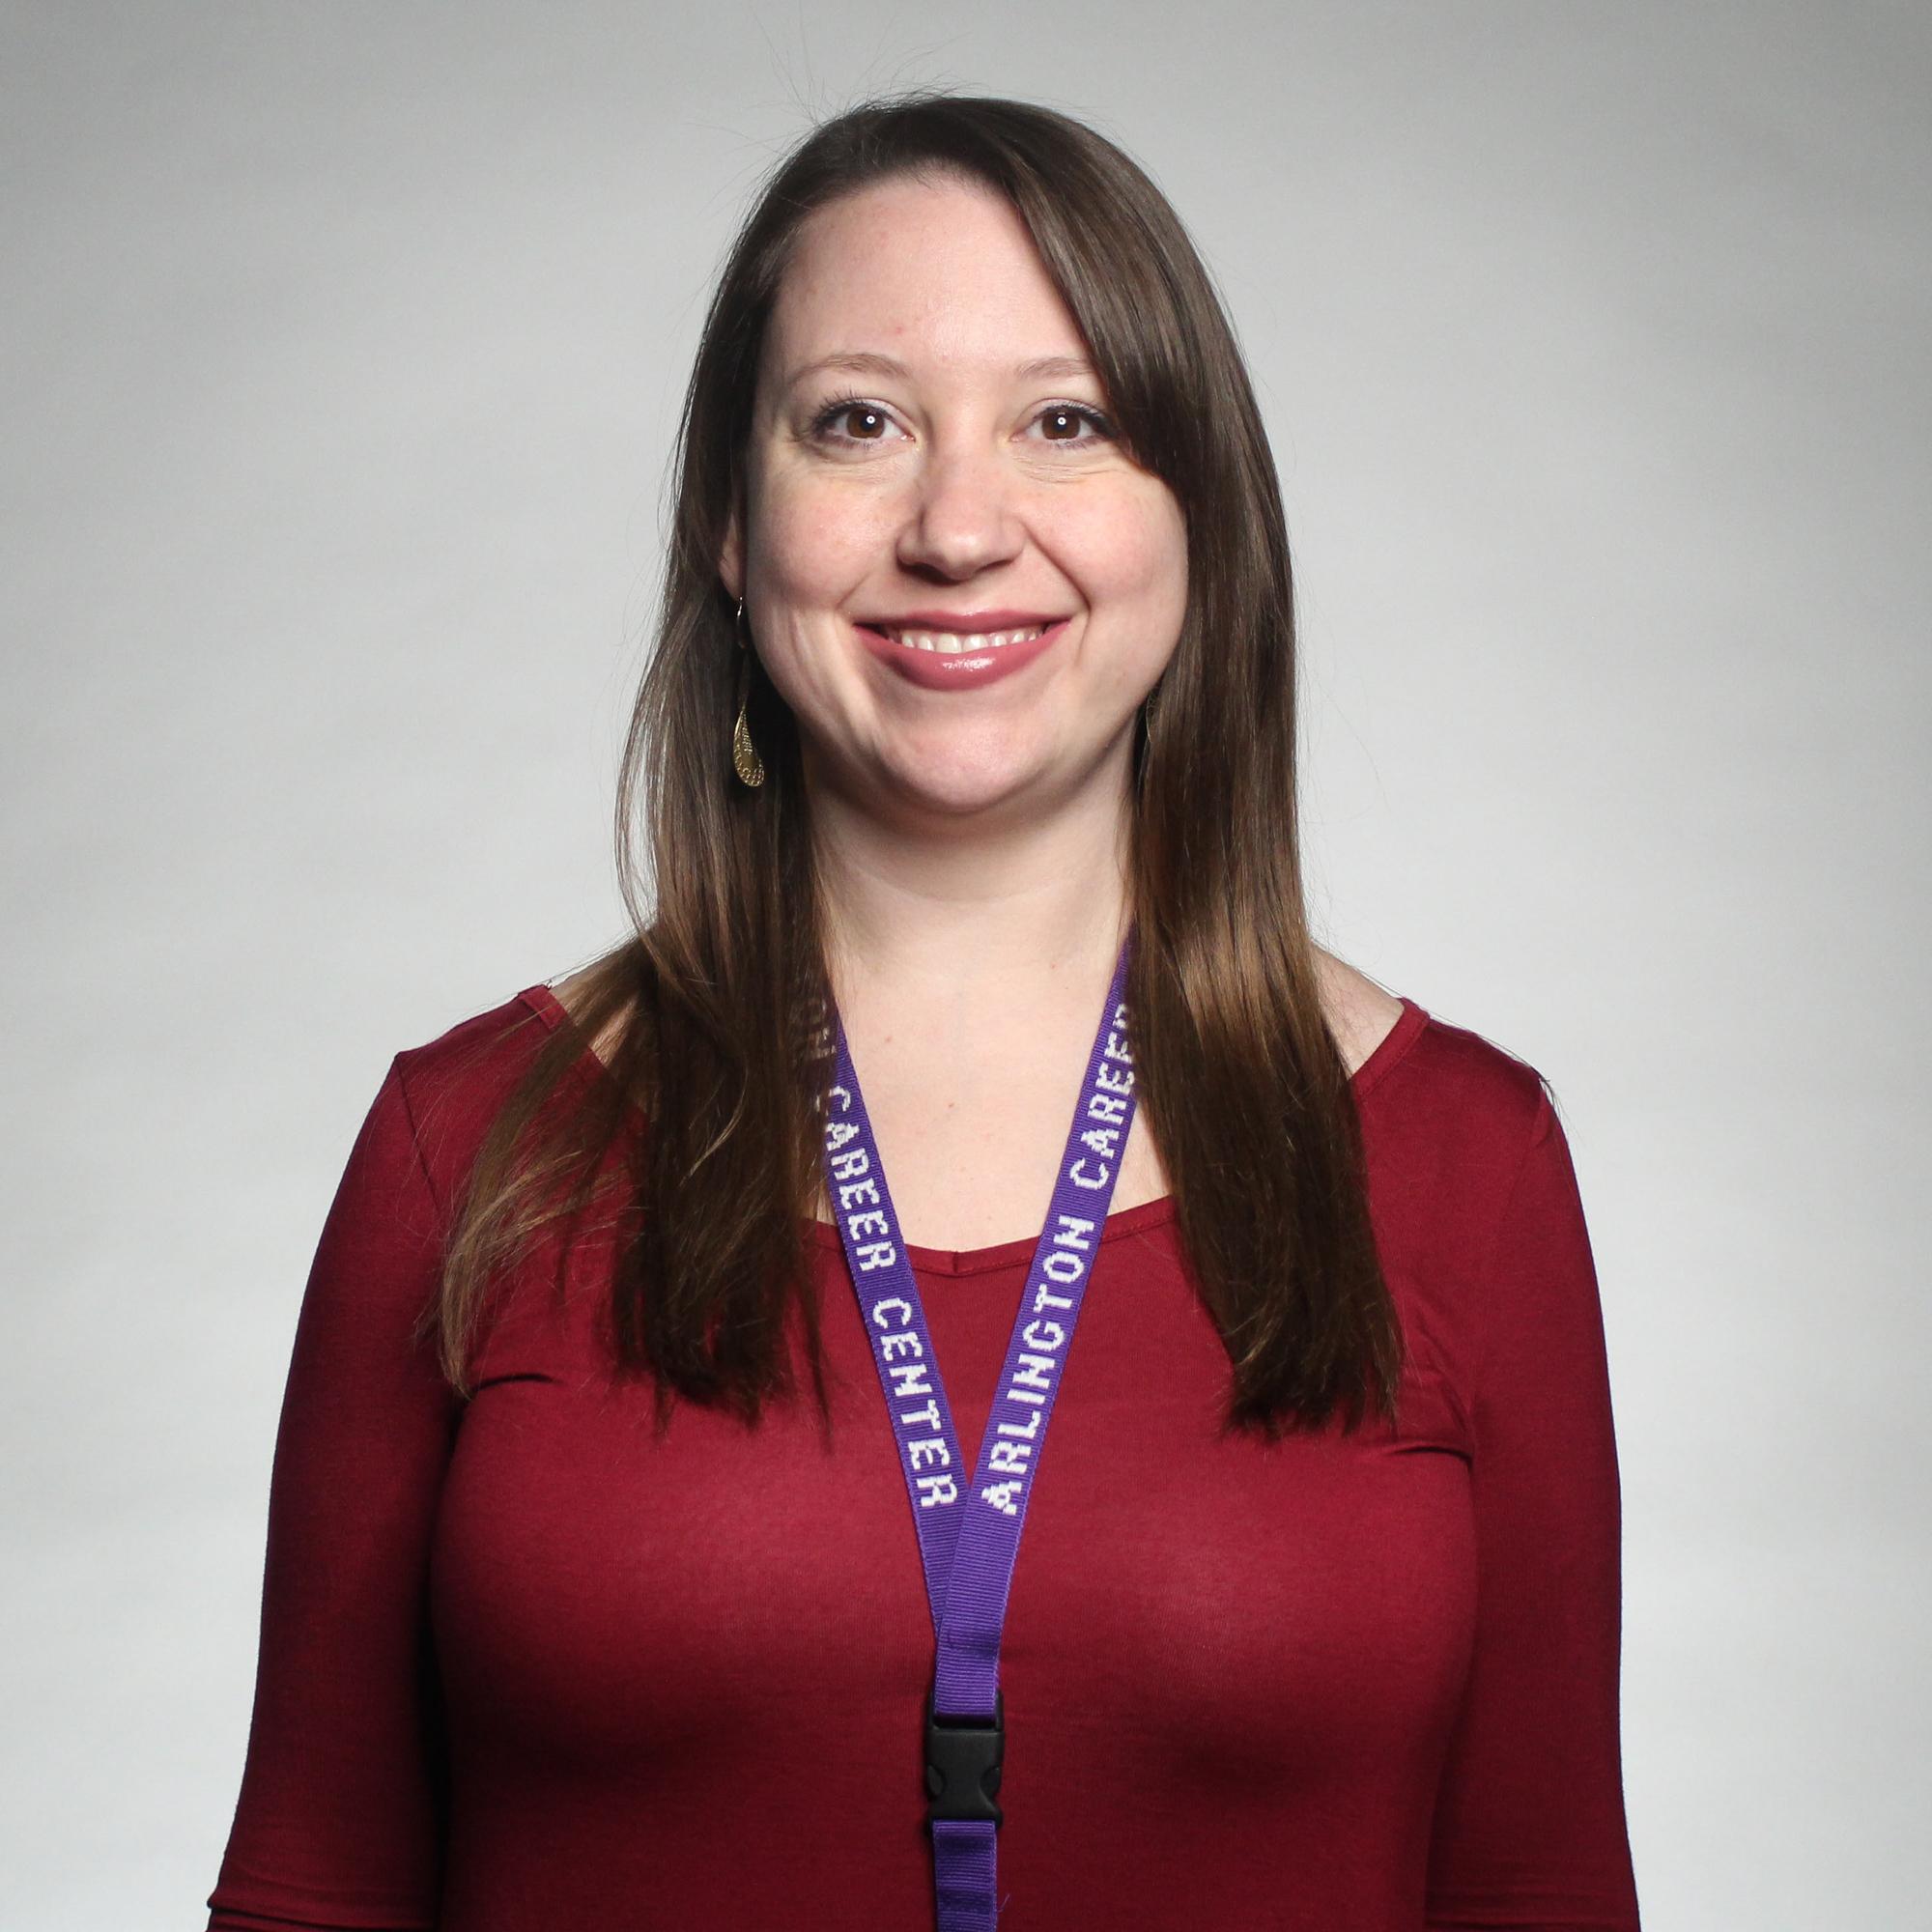 Ms. Ashley Ladner